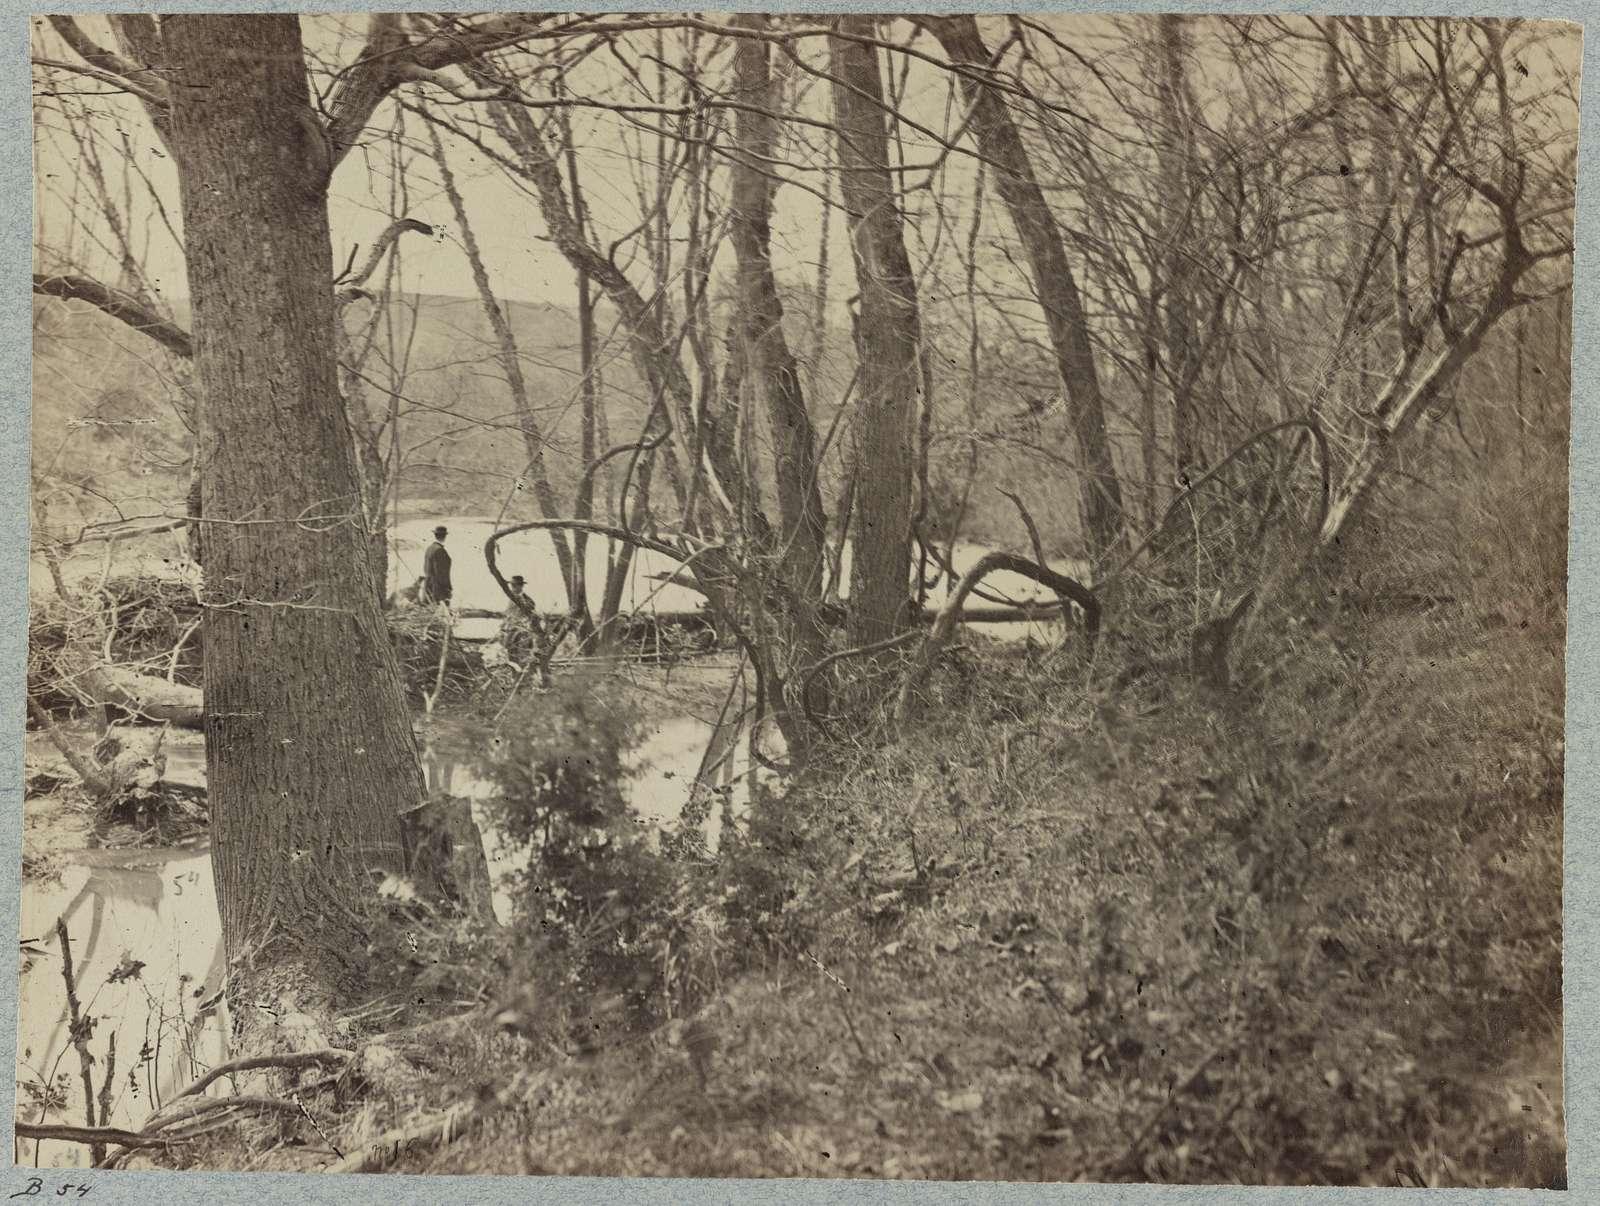 View on Rapidan River, Va.